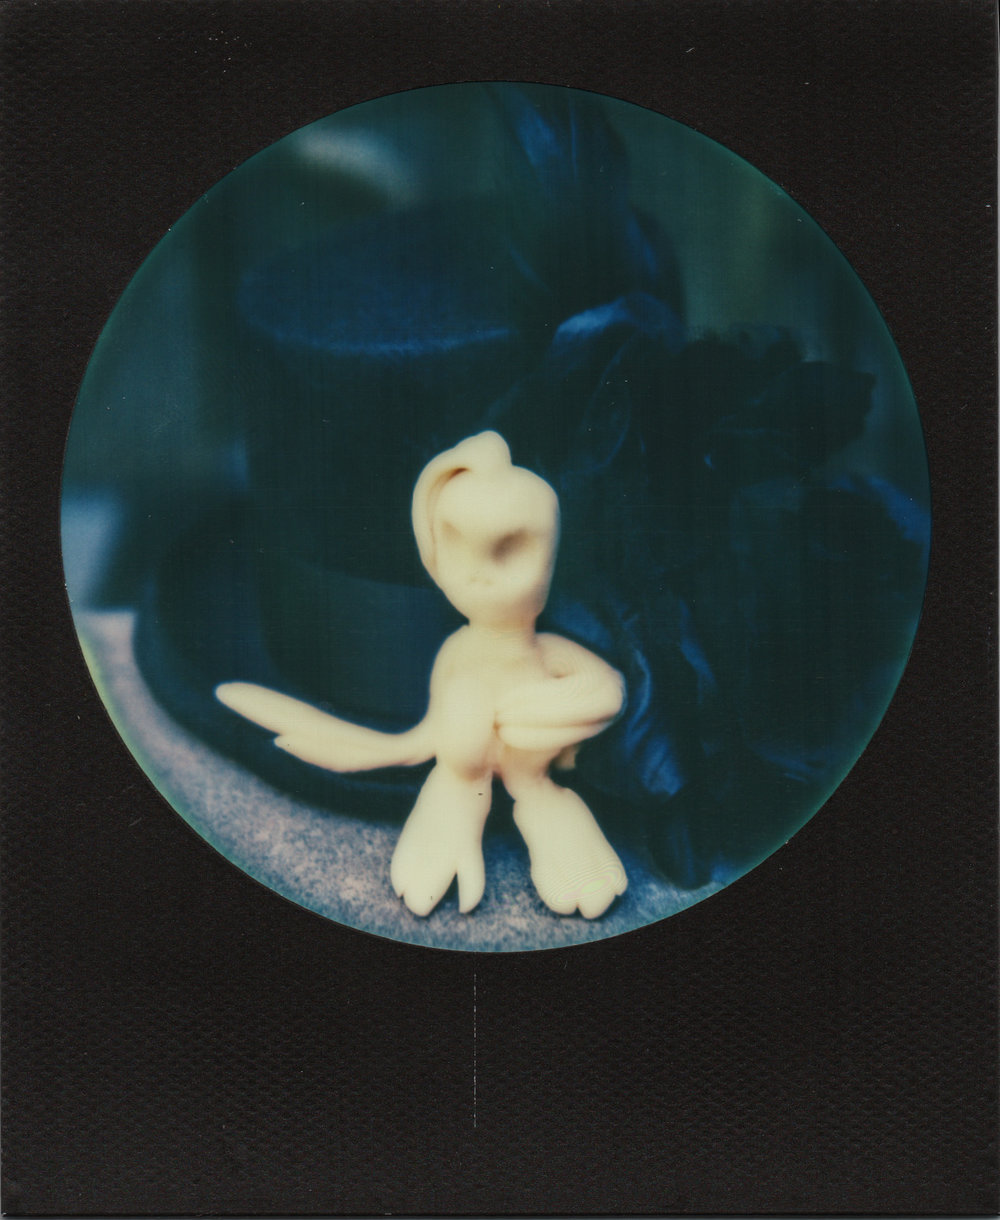 Alien Invasion | Polaroid sx70 | Impossible Round Black Frame | Karin Klaus